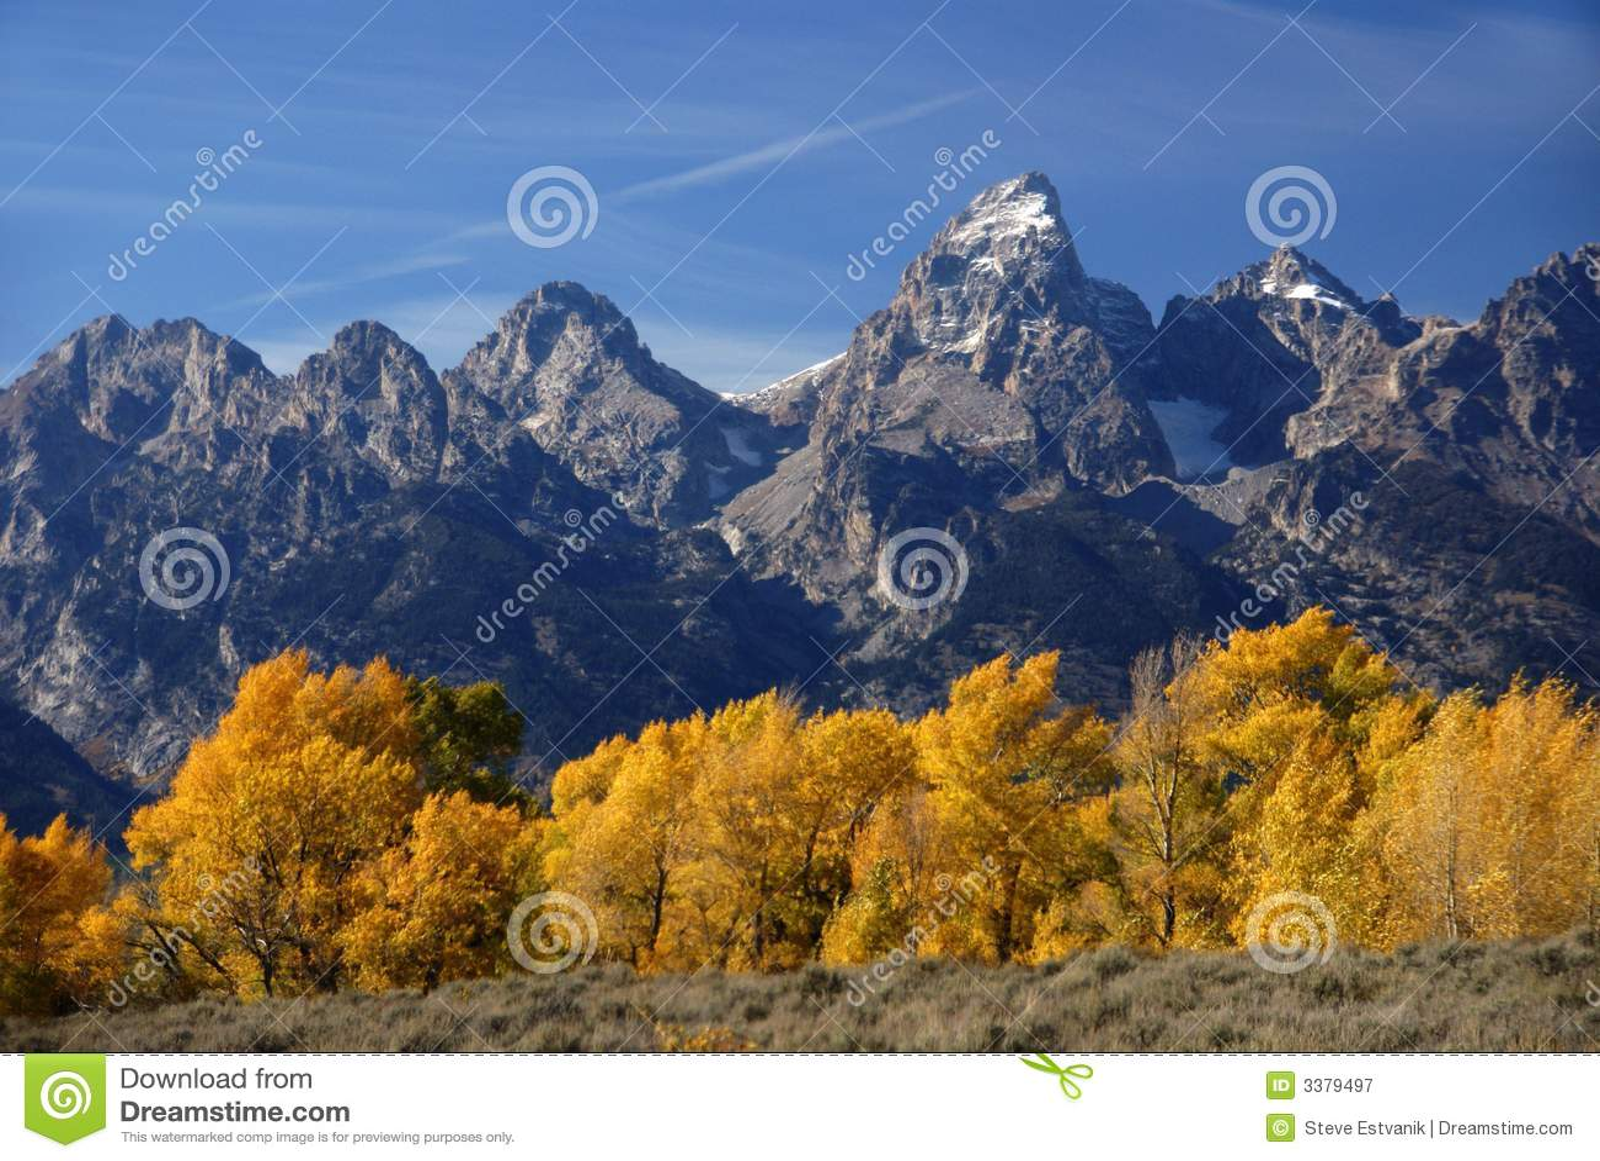 Snake river grand teton national park wyoming - Grand Teton Autumn Royalty Free Stock Photography Image